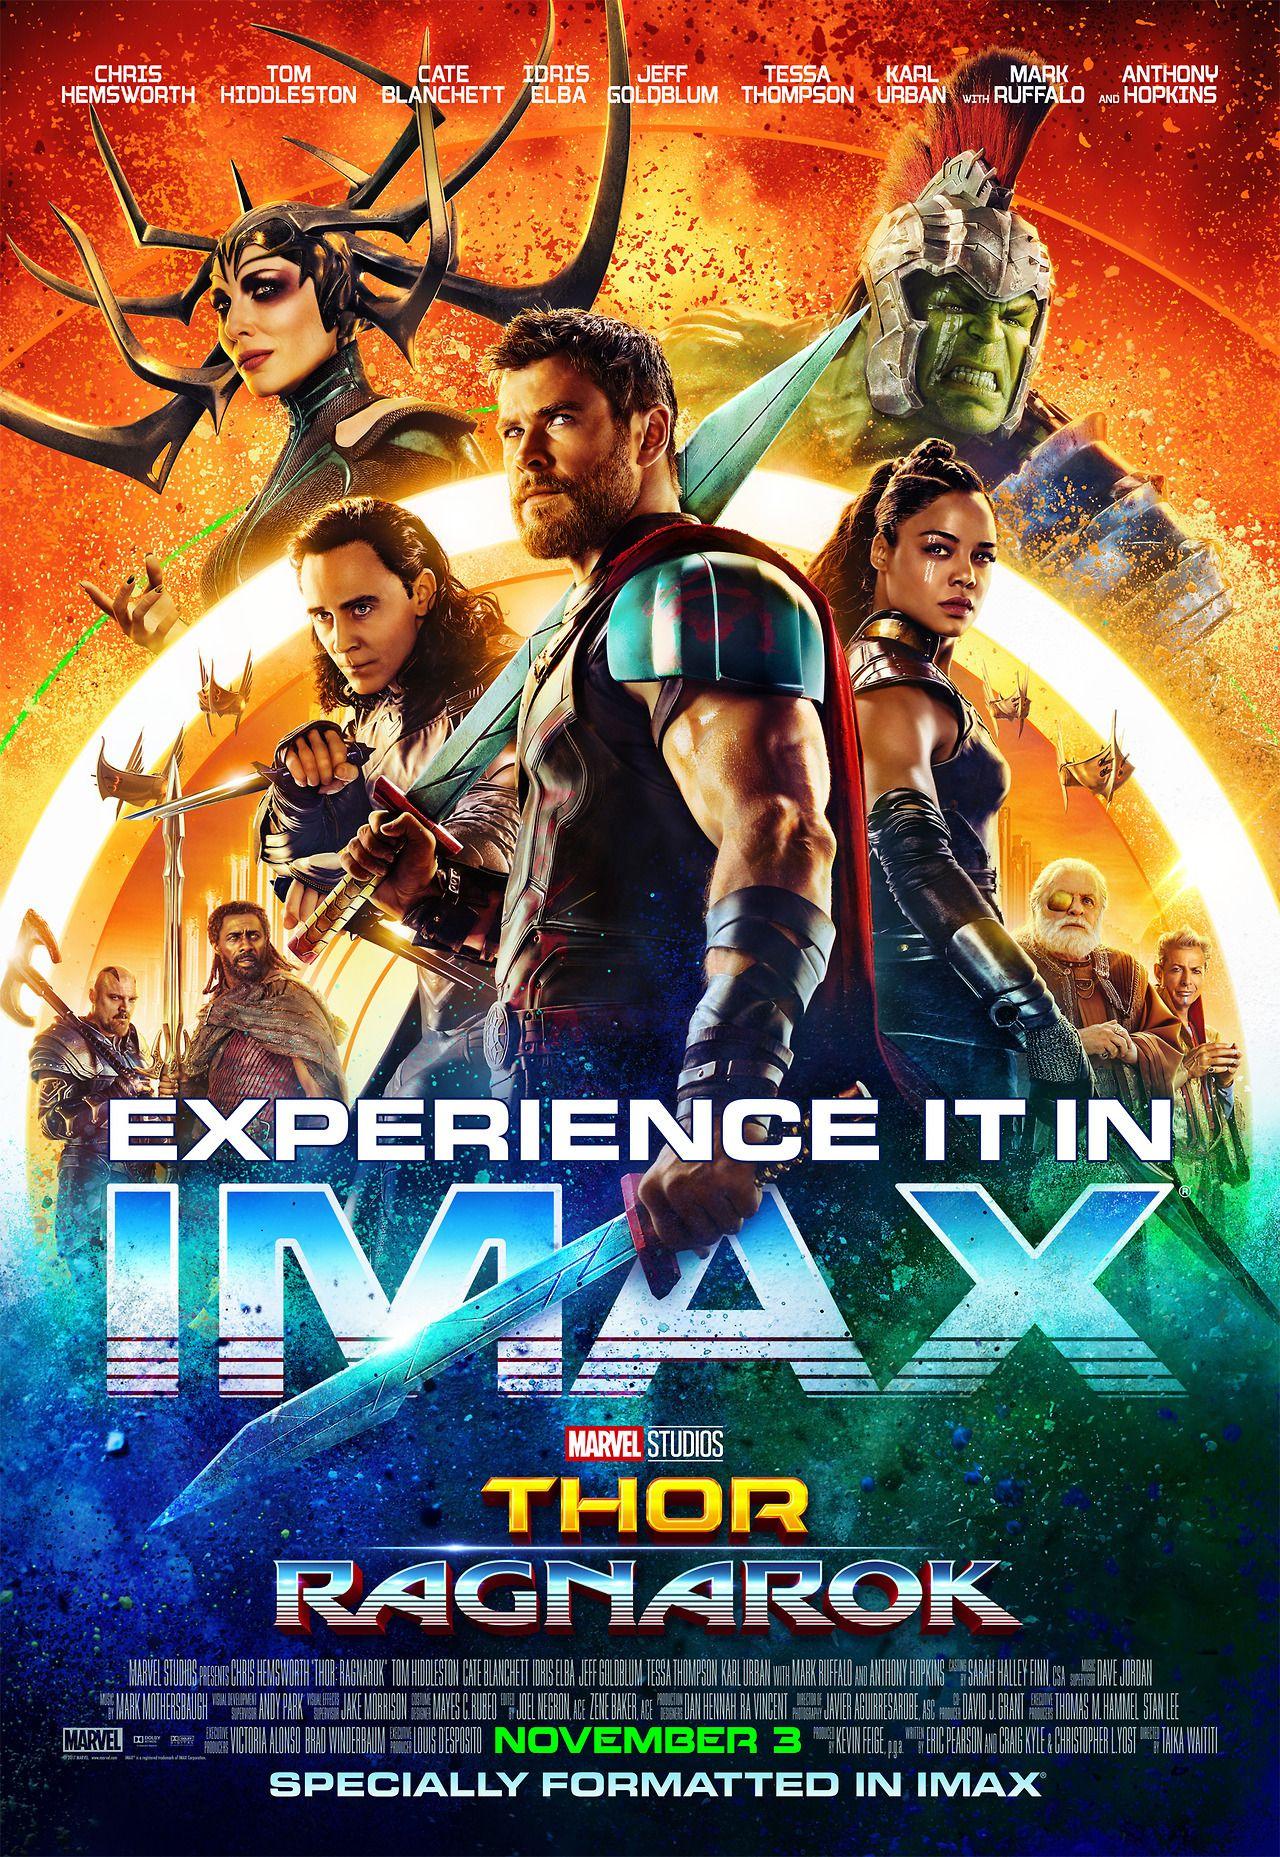 Thor Ragnarok Imax Poster Full Movies Full Movies Online Free